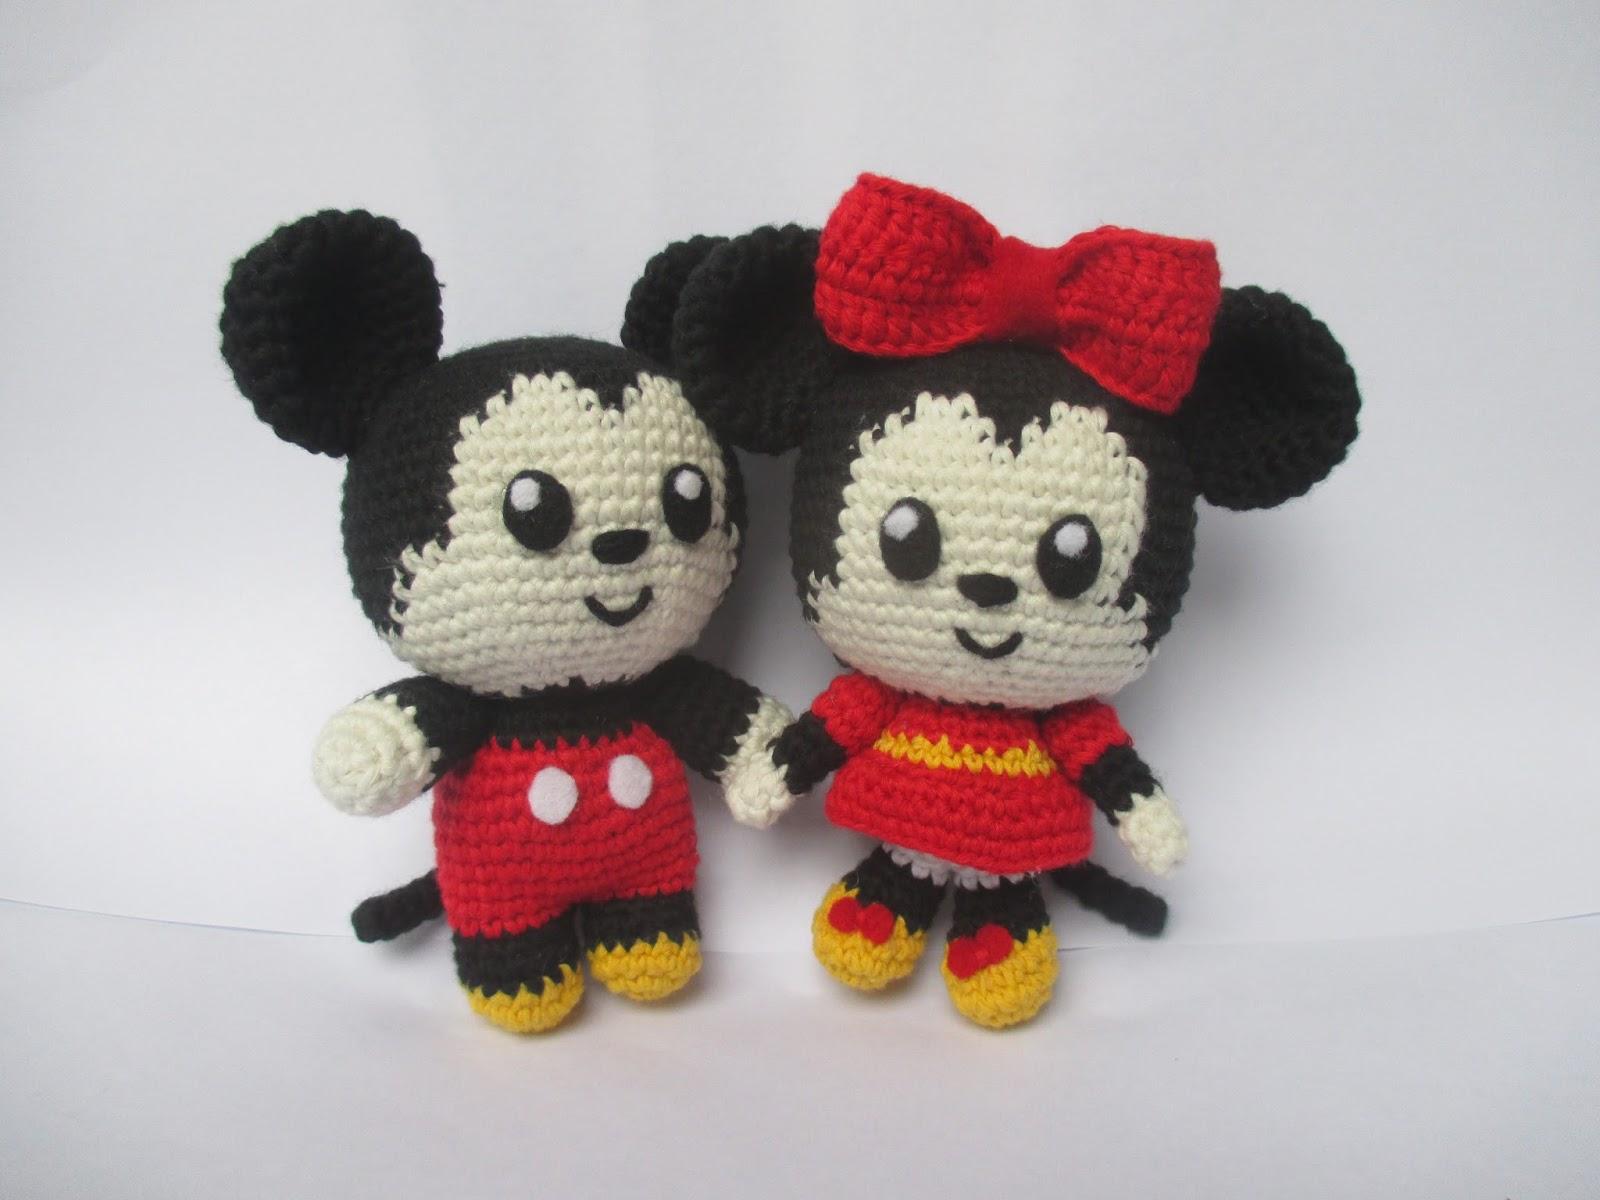 Amigurumi Boneka : Free crochet pattern amigurumi mickey dan minnie mouse craft lotus